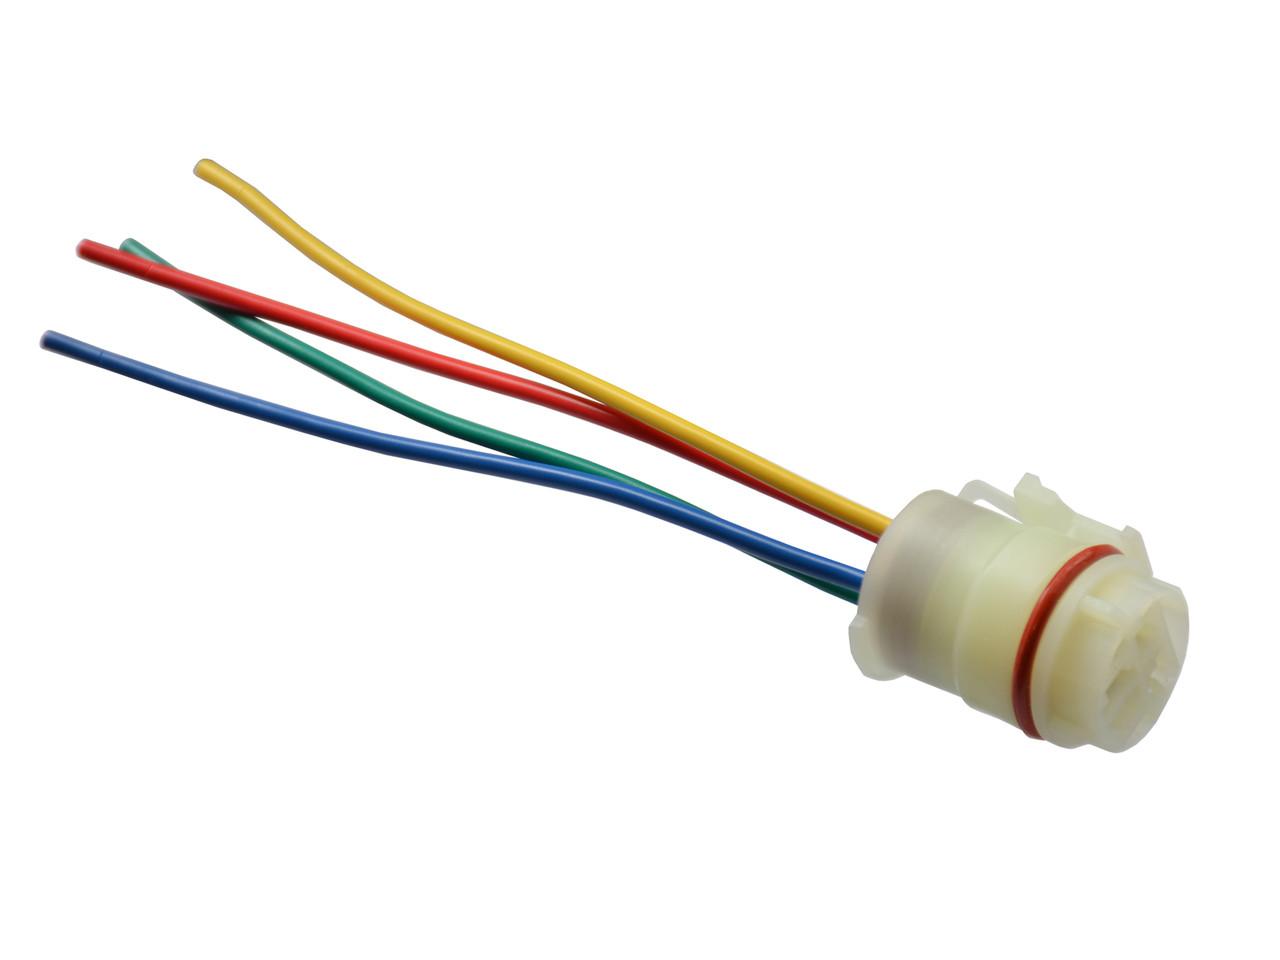 alternator repair plug harness connector fits hitachi isuzu rodeo honda passport 2 6l [ 1280 x 960 Pixel ]